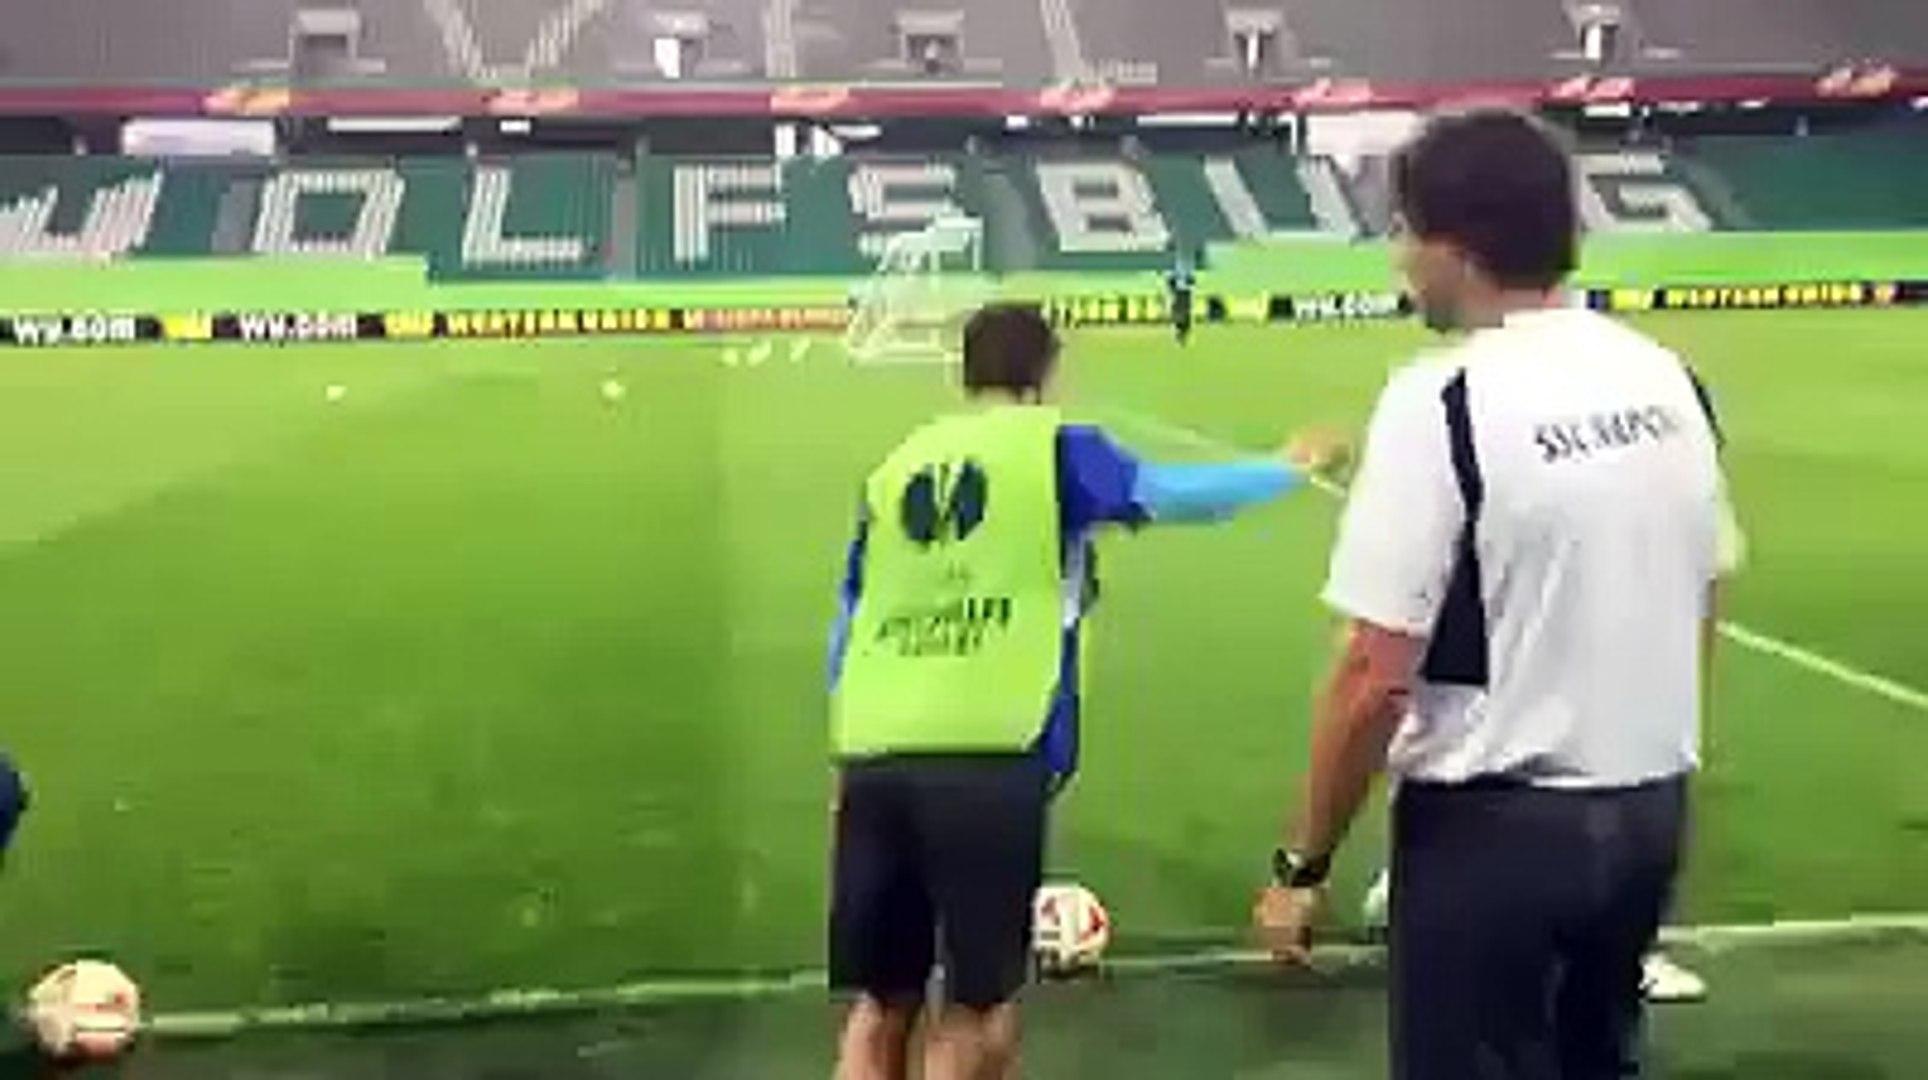 Manolo Gabbiadini amazing goal in training session waiting for Wolfsburg-Napoli UEFA Europa League